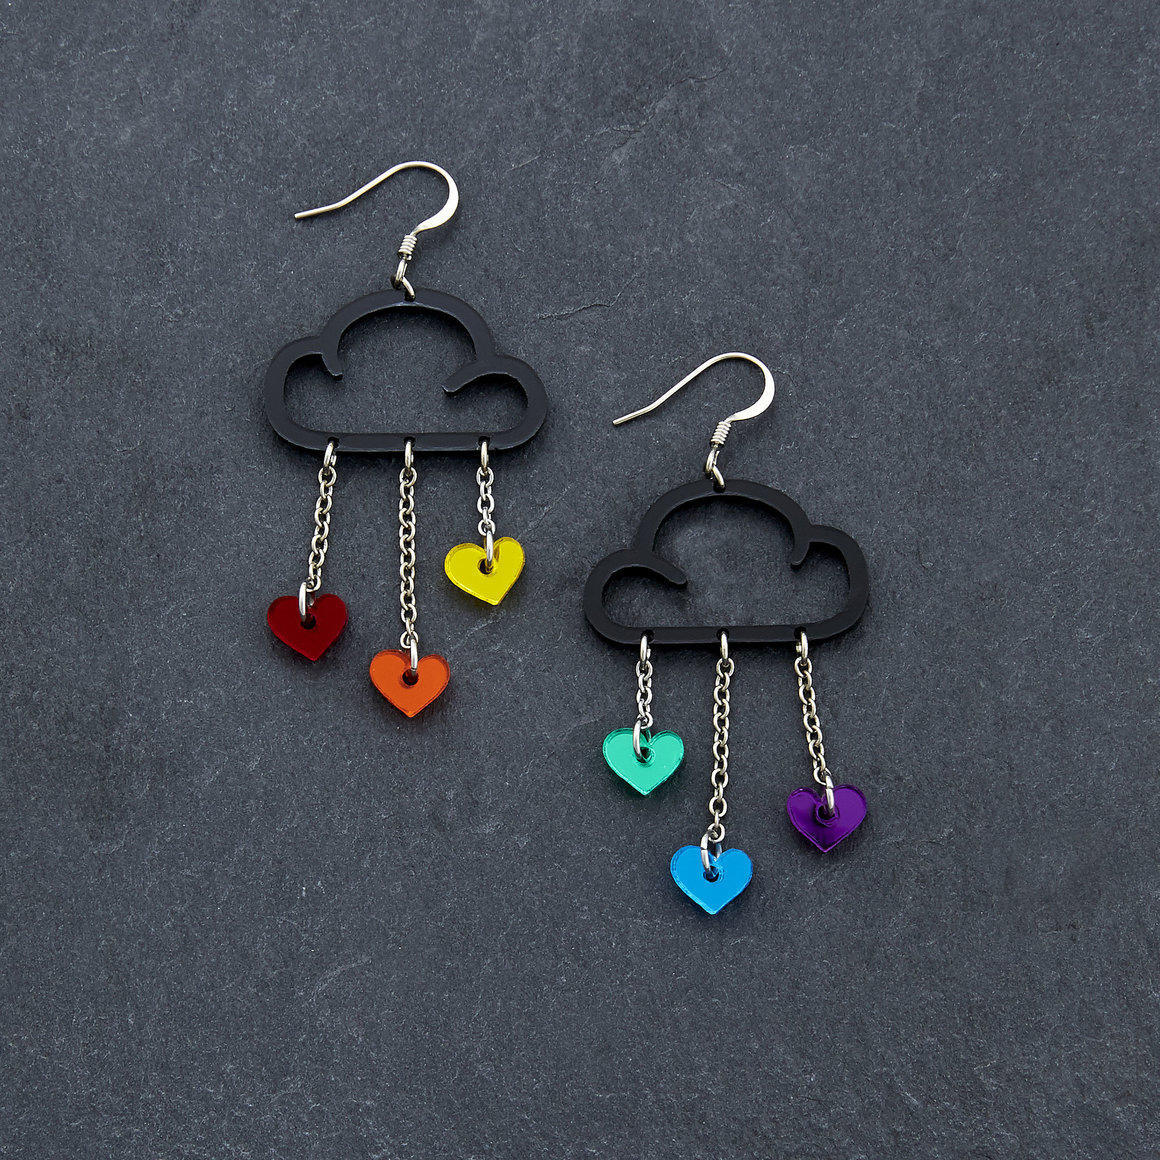 Dangle Earrings - LOVE RAIN - Black Rainbow | Trada Marketplace